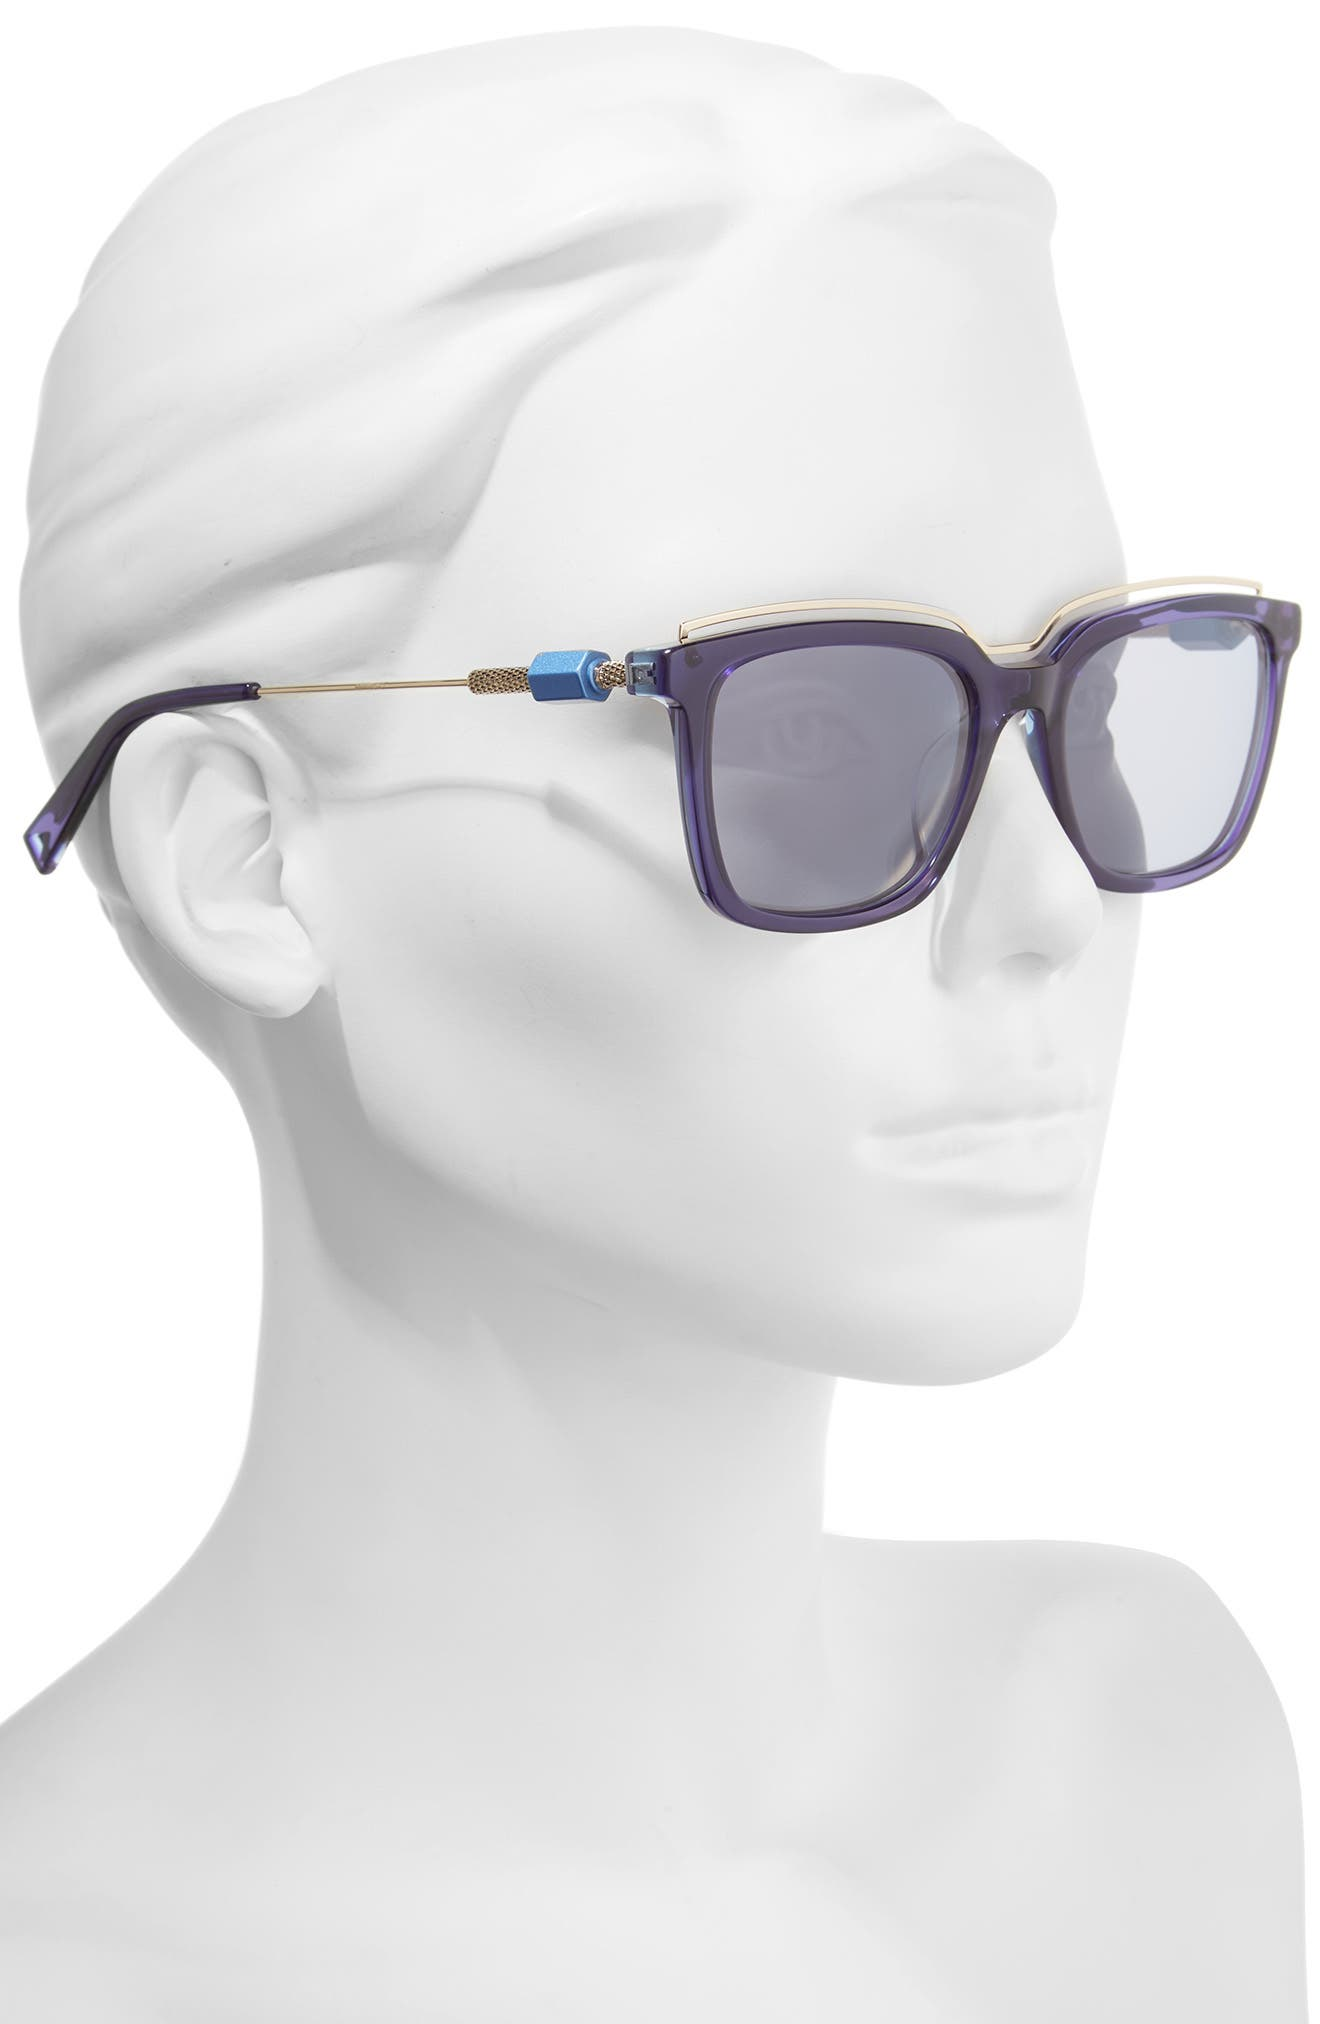 Opus 54mm Sunglasses,                             Alternate thumbnail 6, color,